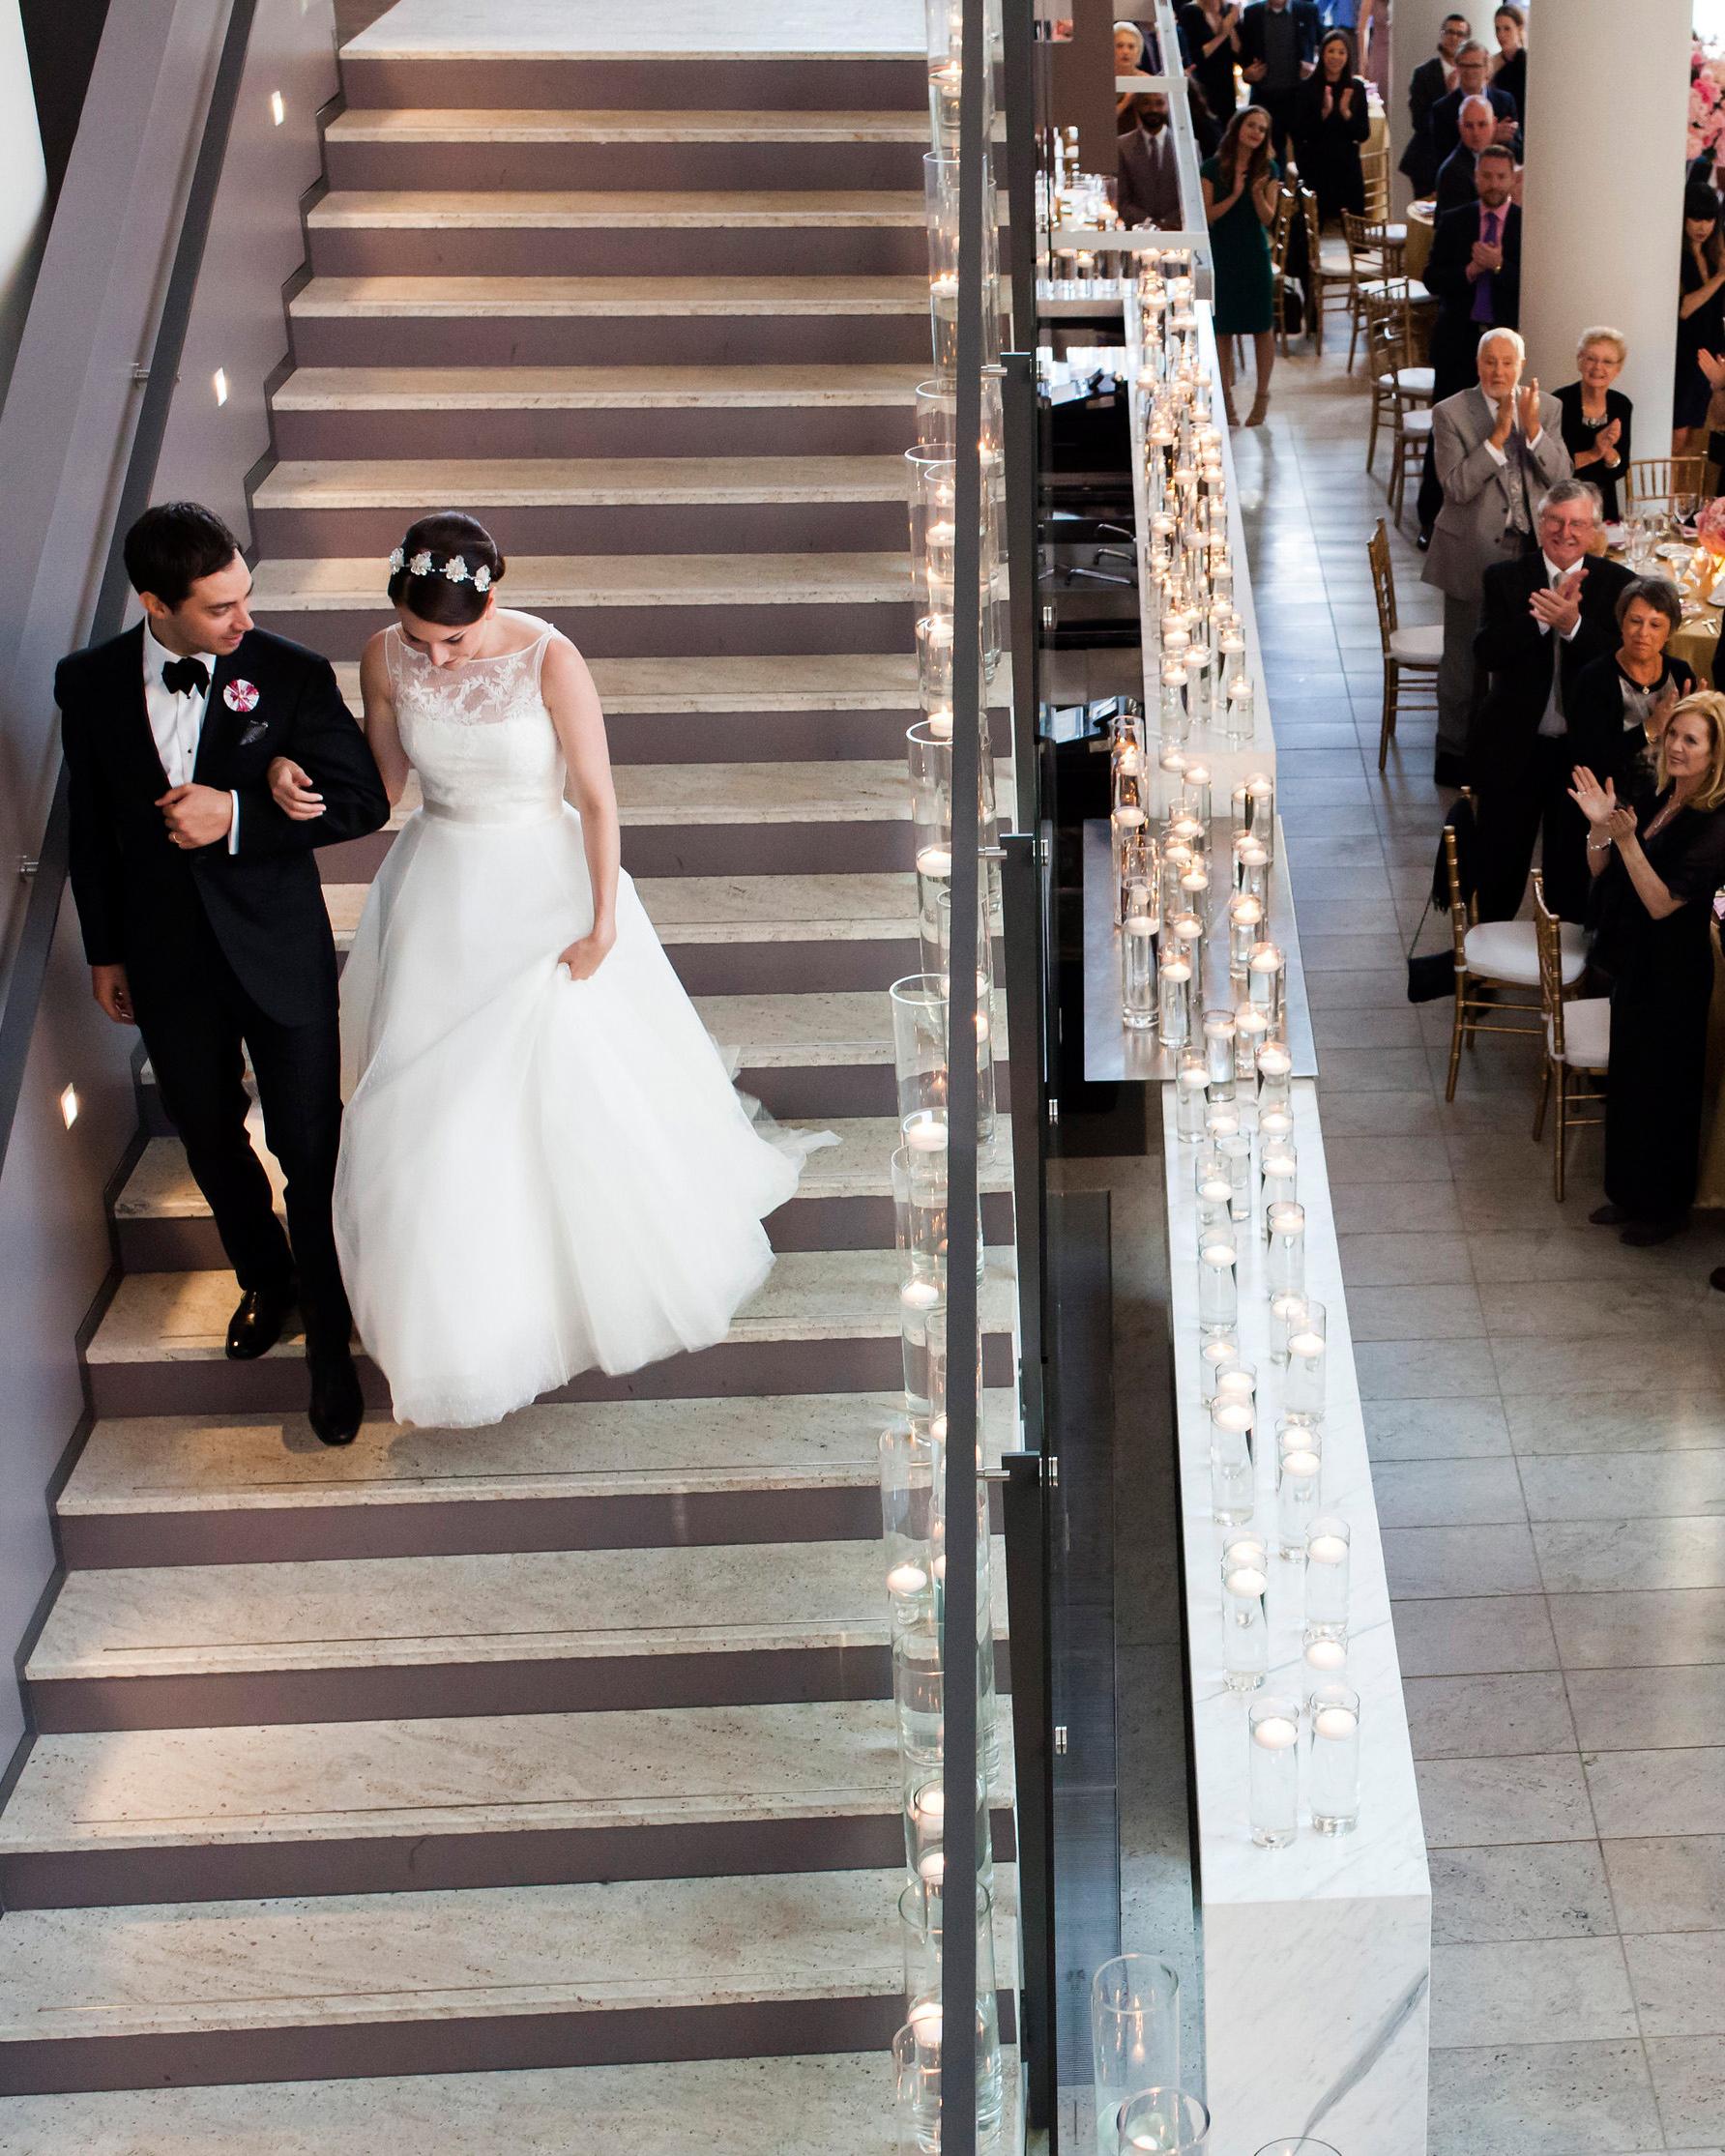 ashley-ryan-wedding-couple-7494-s111852-0415.jpg